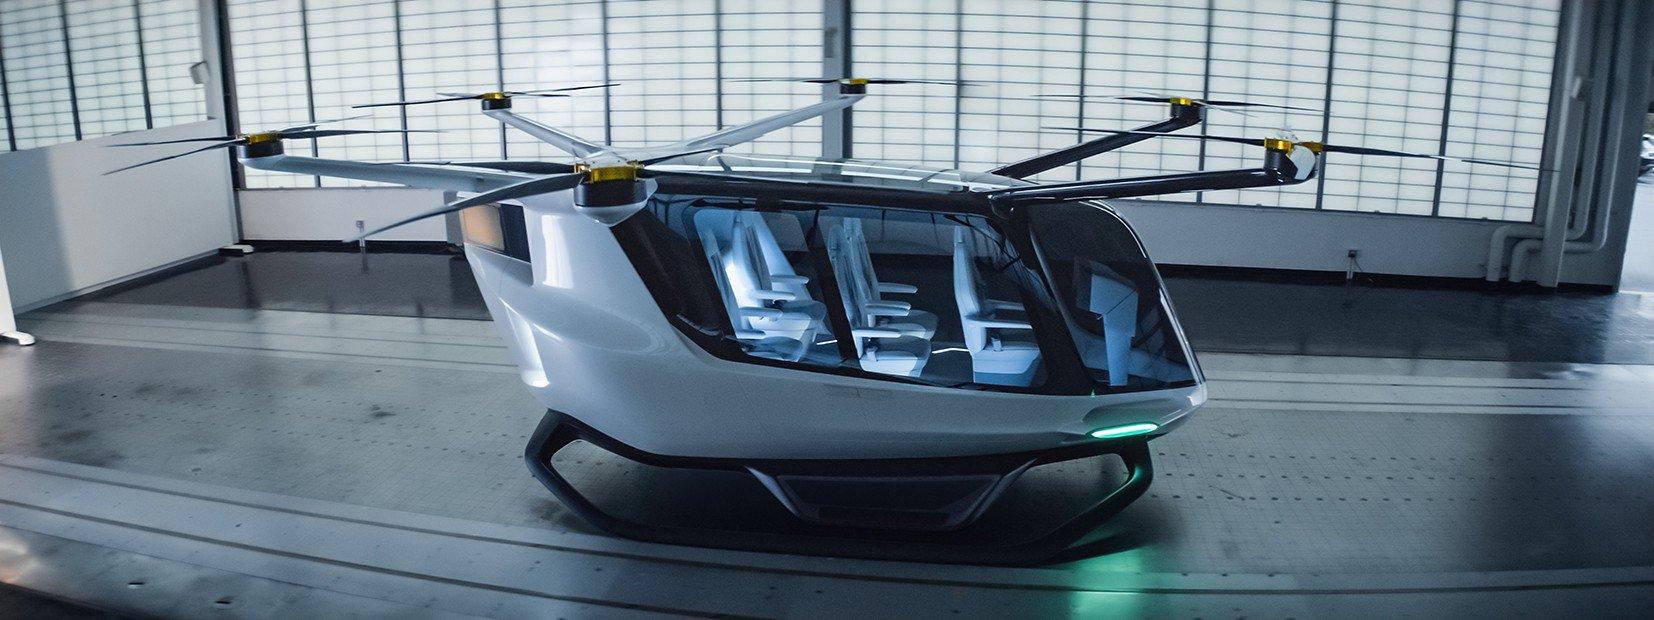 Alakai-Technologies-Skai-flying-car-2